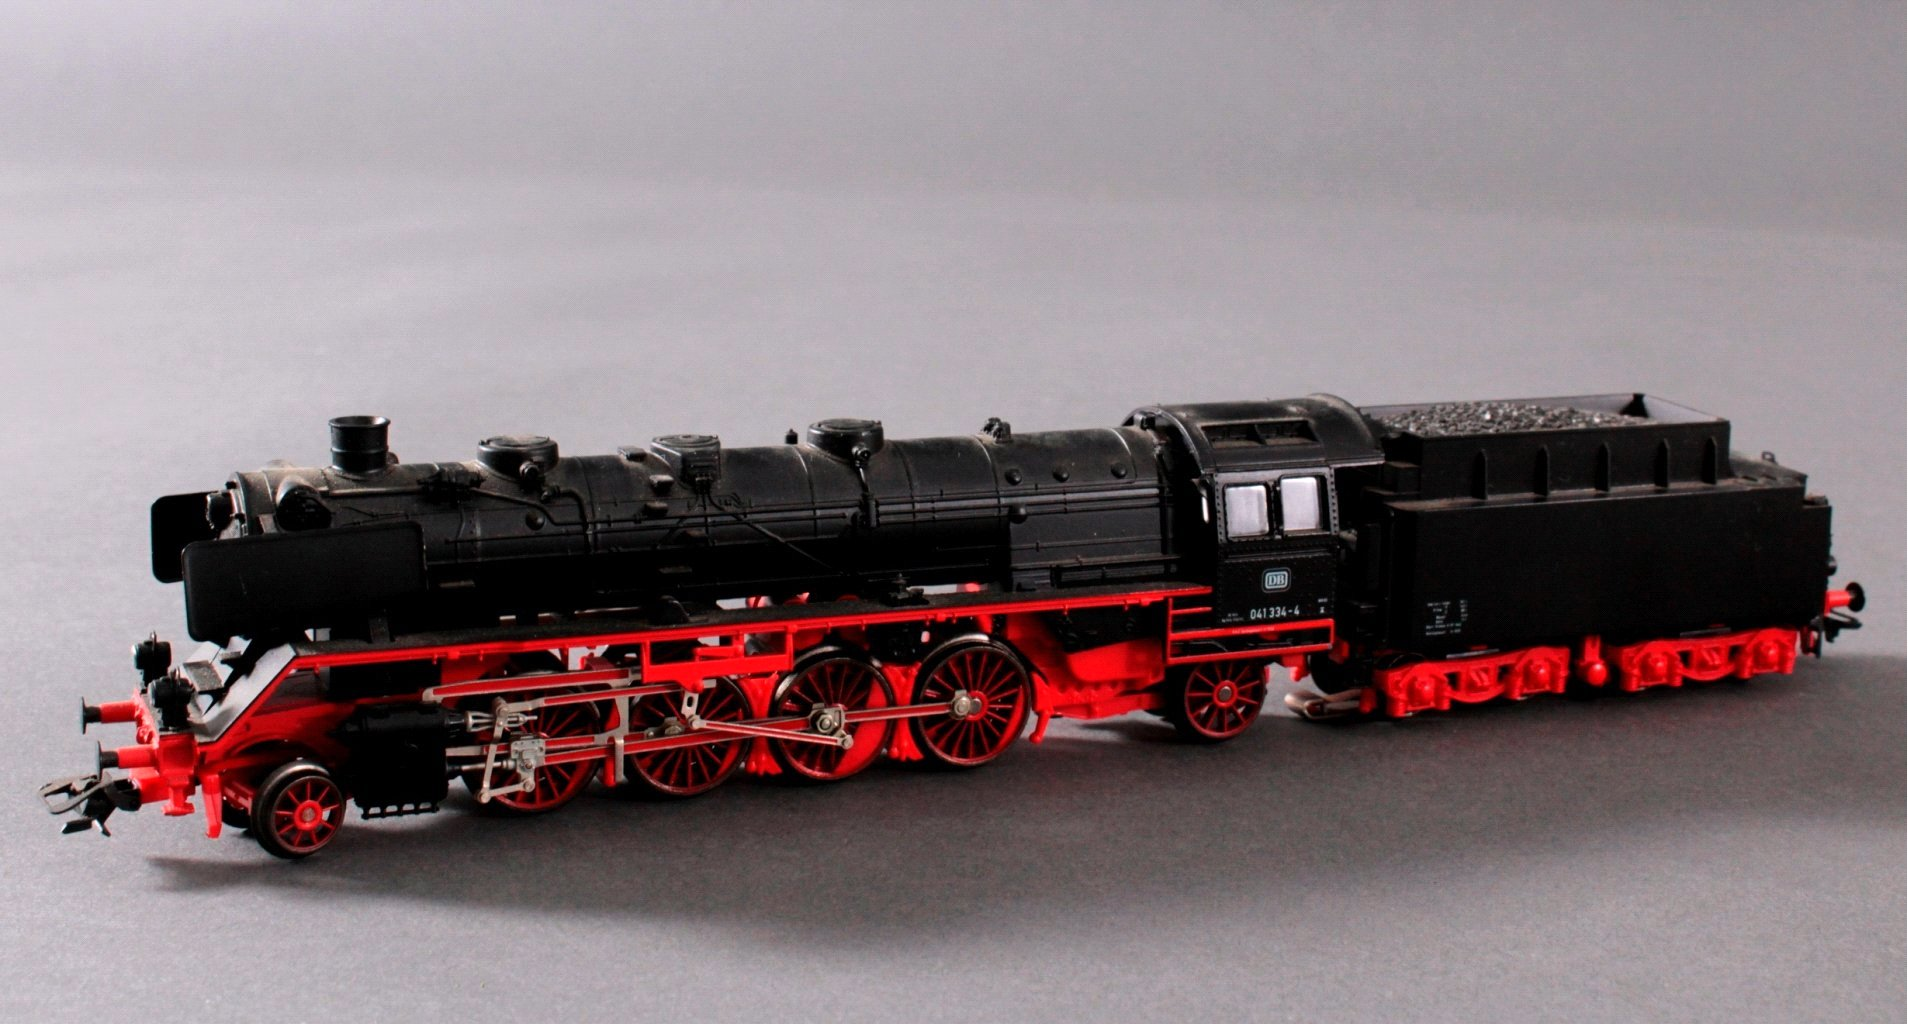 Märklin BR 041334-4 Dampf-Lok DB in schwarz mit-1